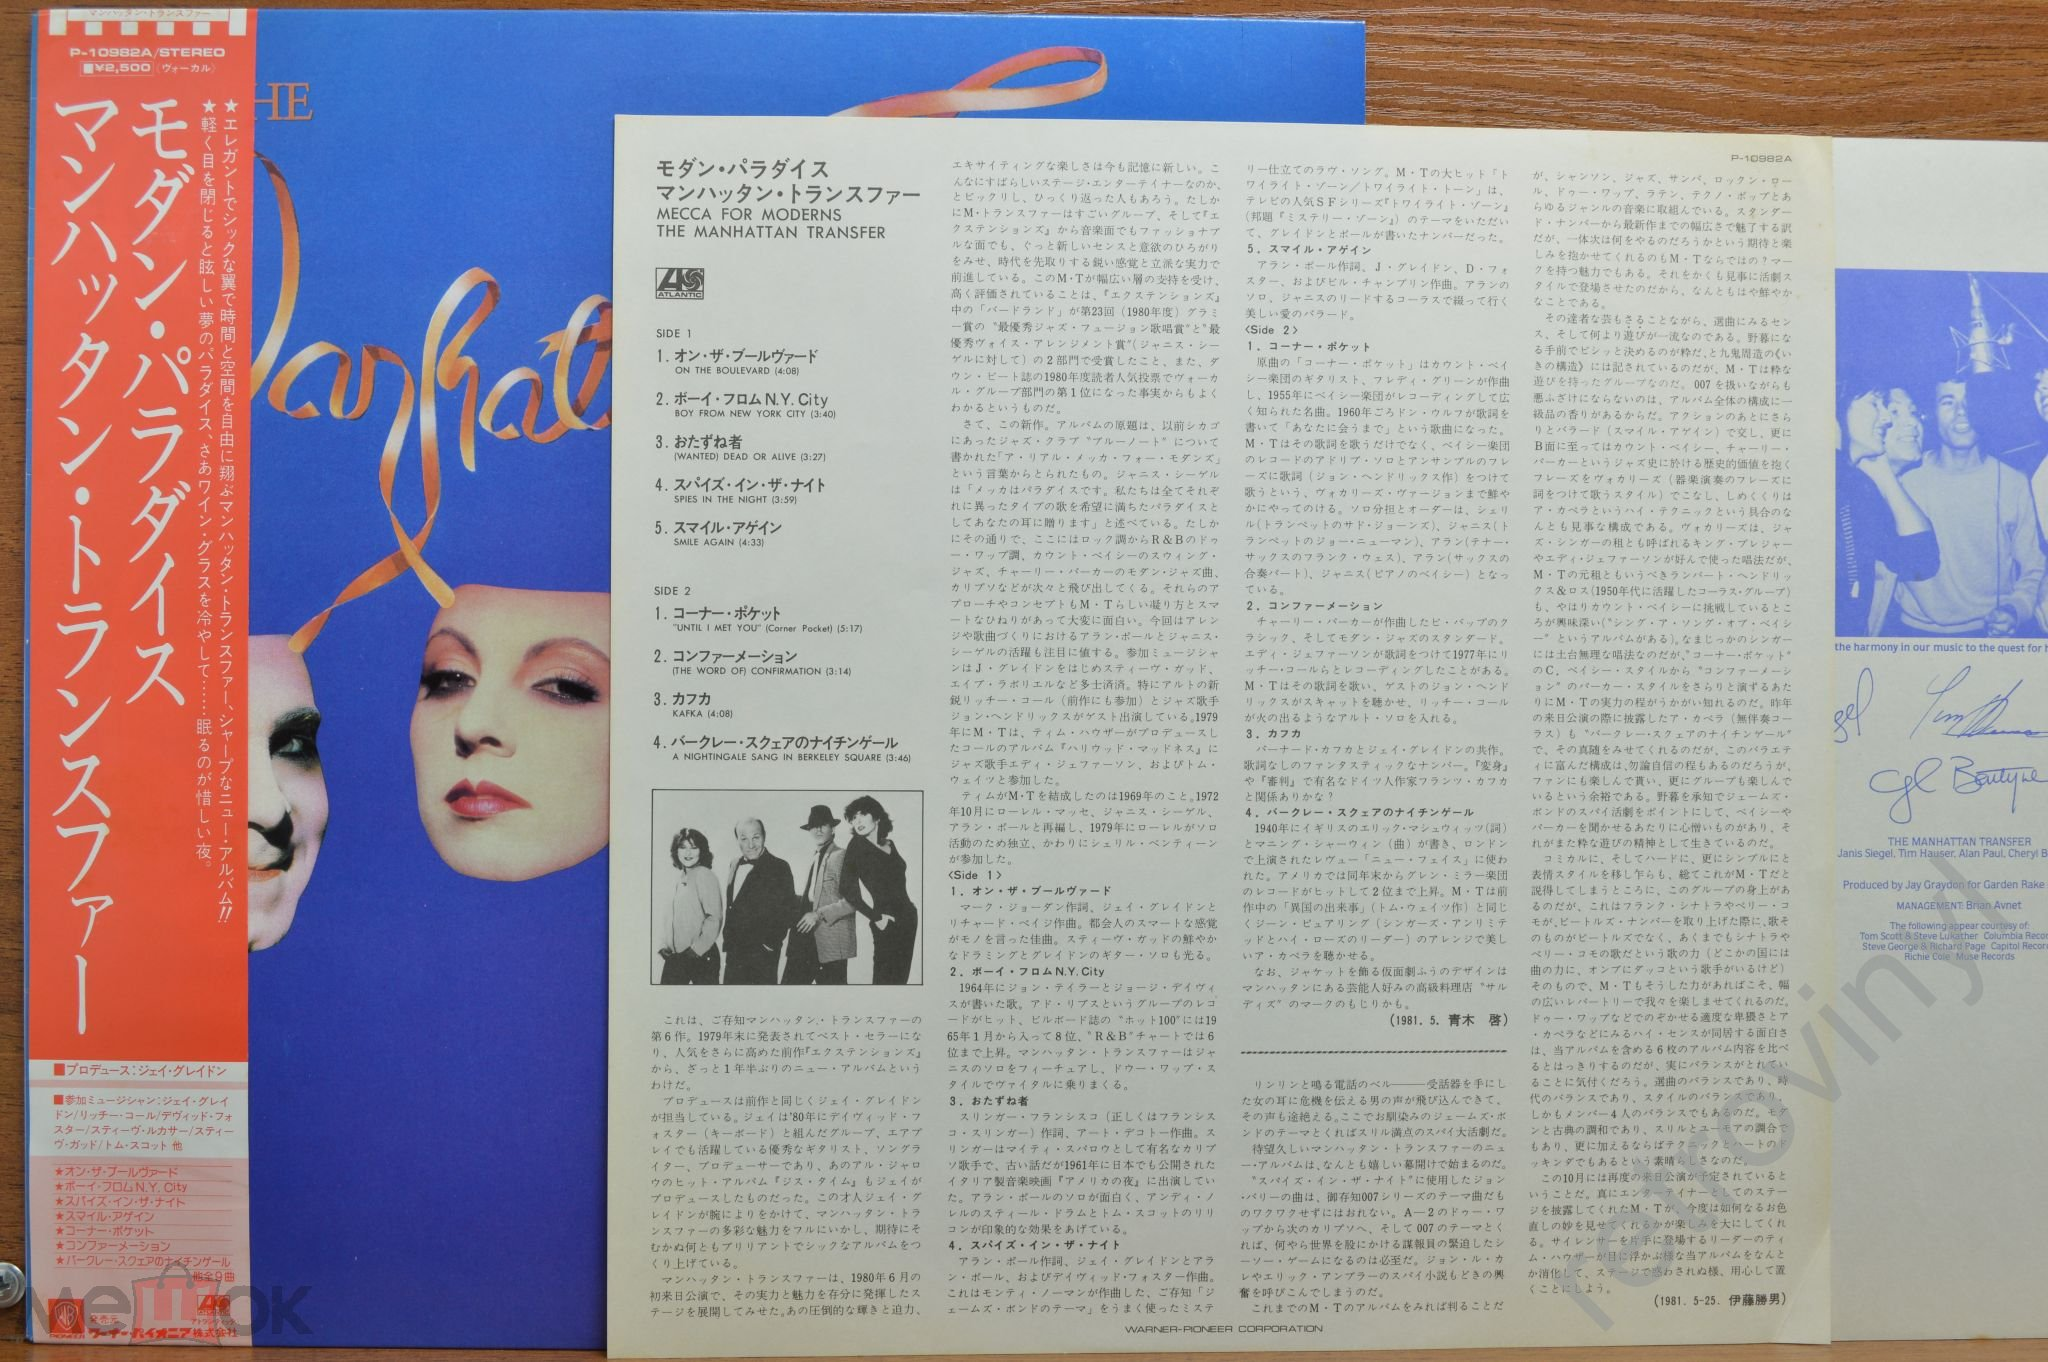 MANHATTAN TRANSFER, THE - Mecca For Moderns - P-10982A Warner-Pioneer ORIGINAL JAPAN пресс MINT